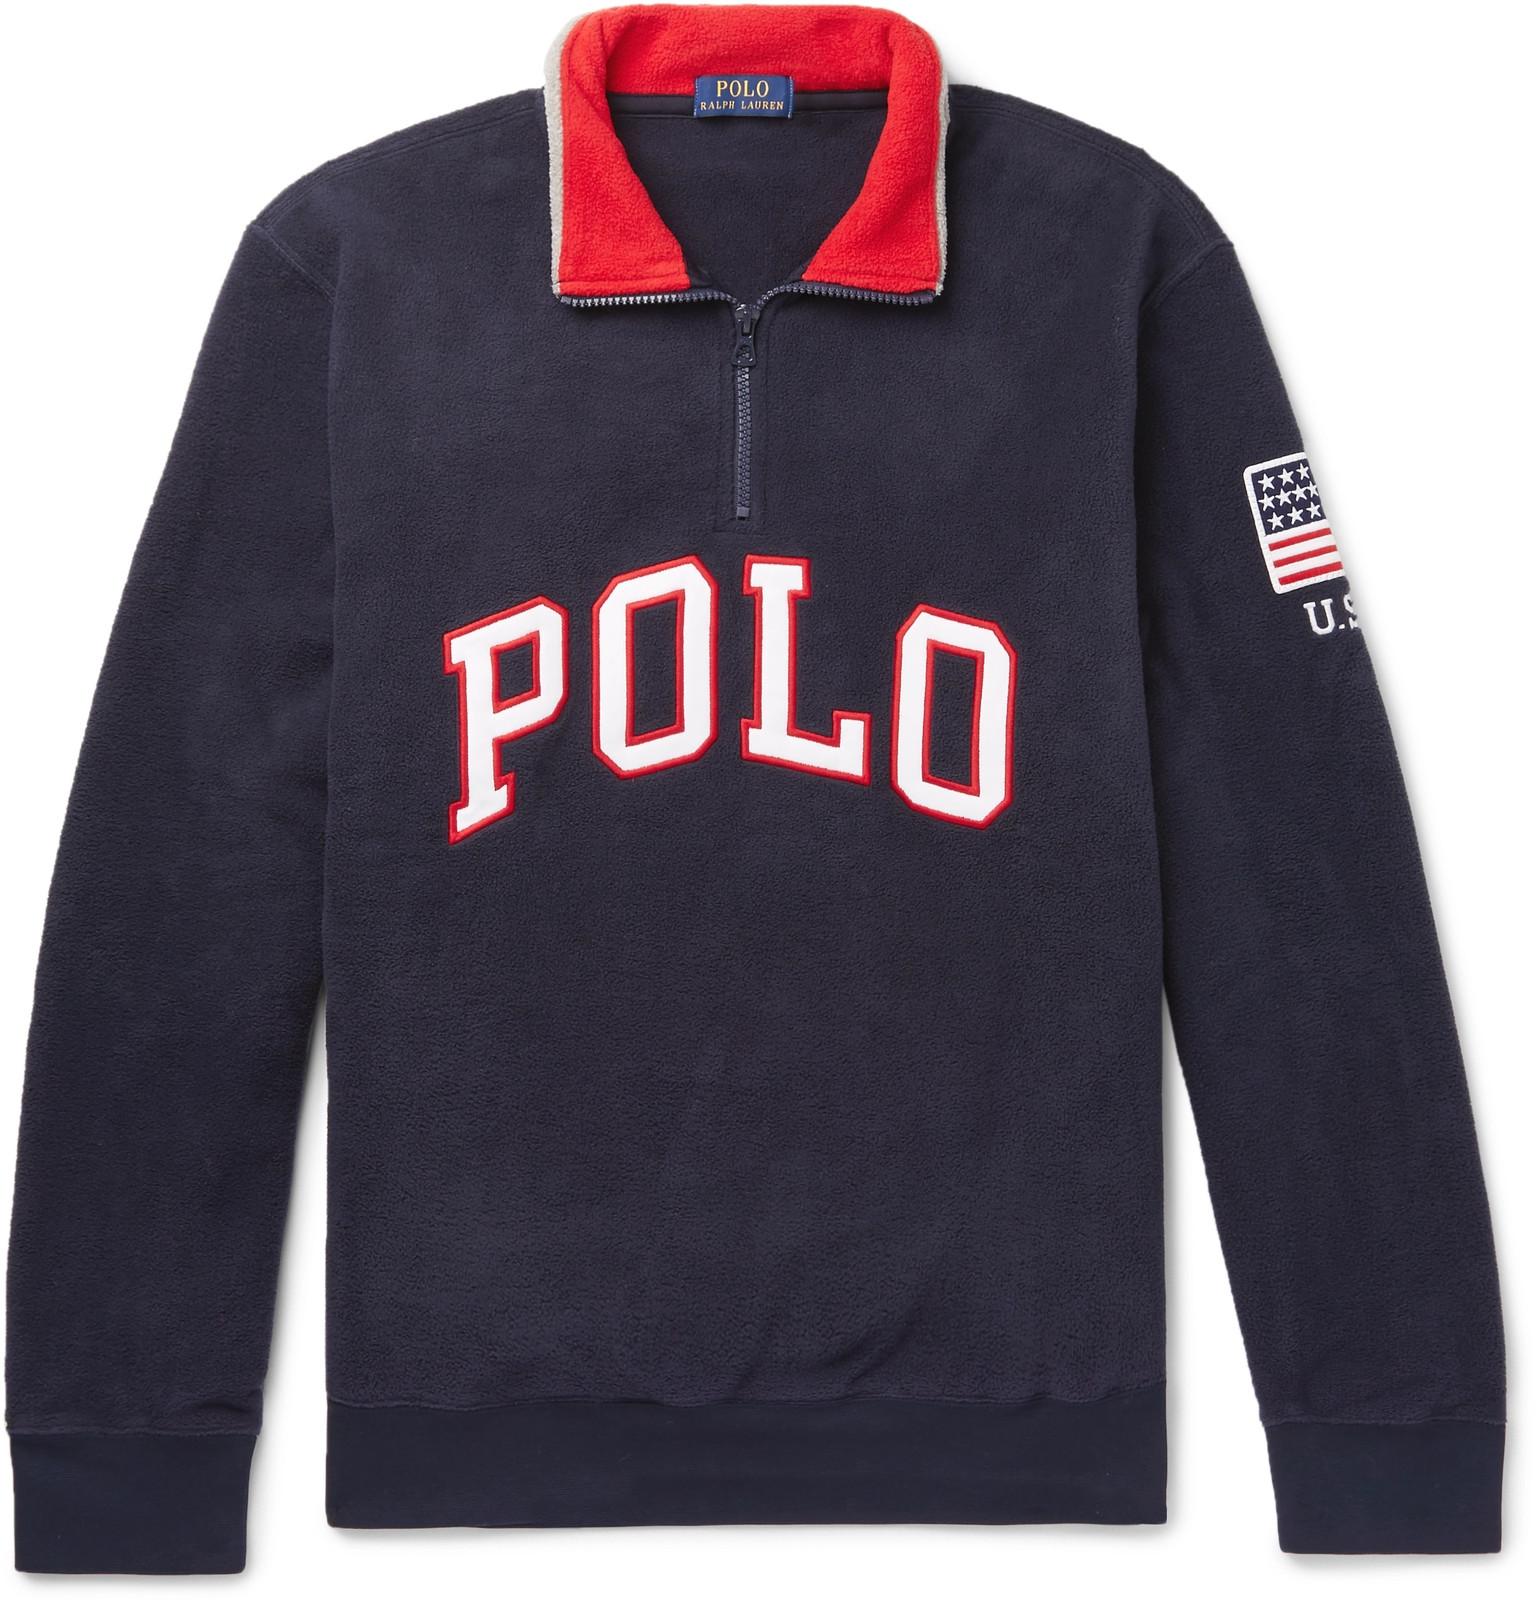 Polo Ralph Lauren - Logo-Appliquéd Fleece Half-Zip Sweatshirt 5e3ebe50ed6